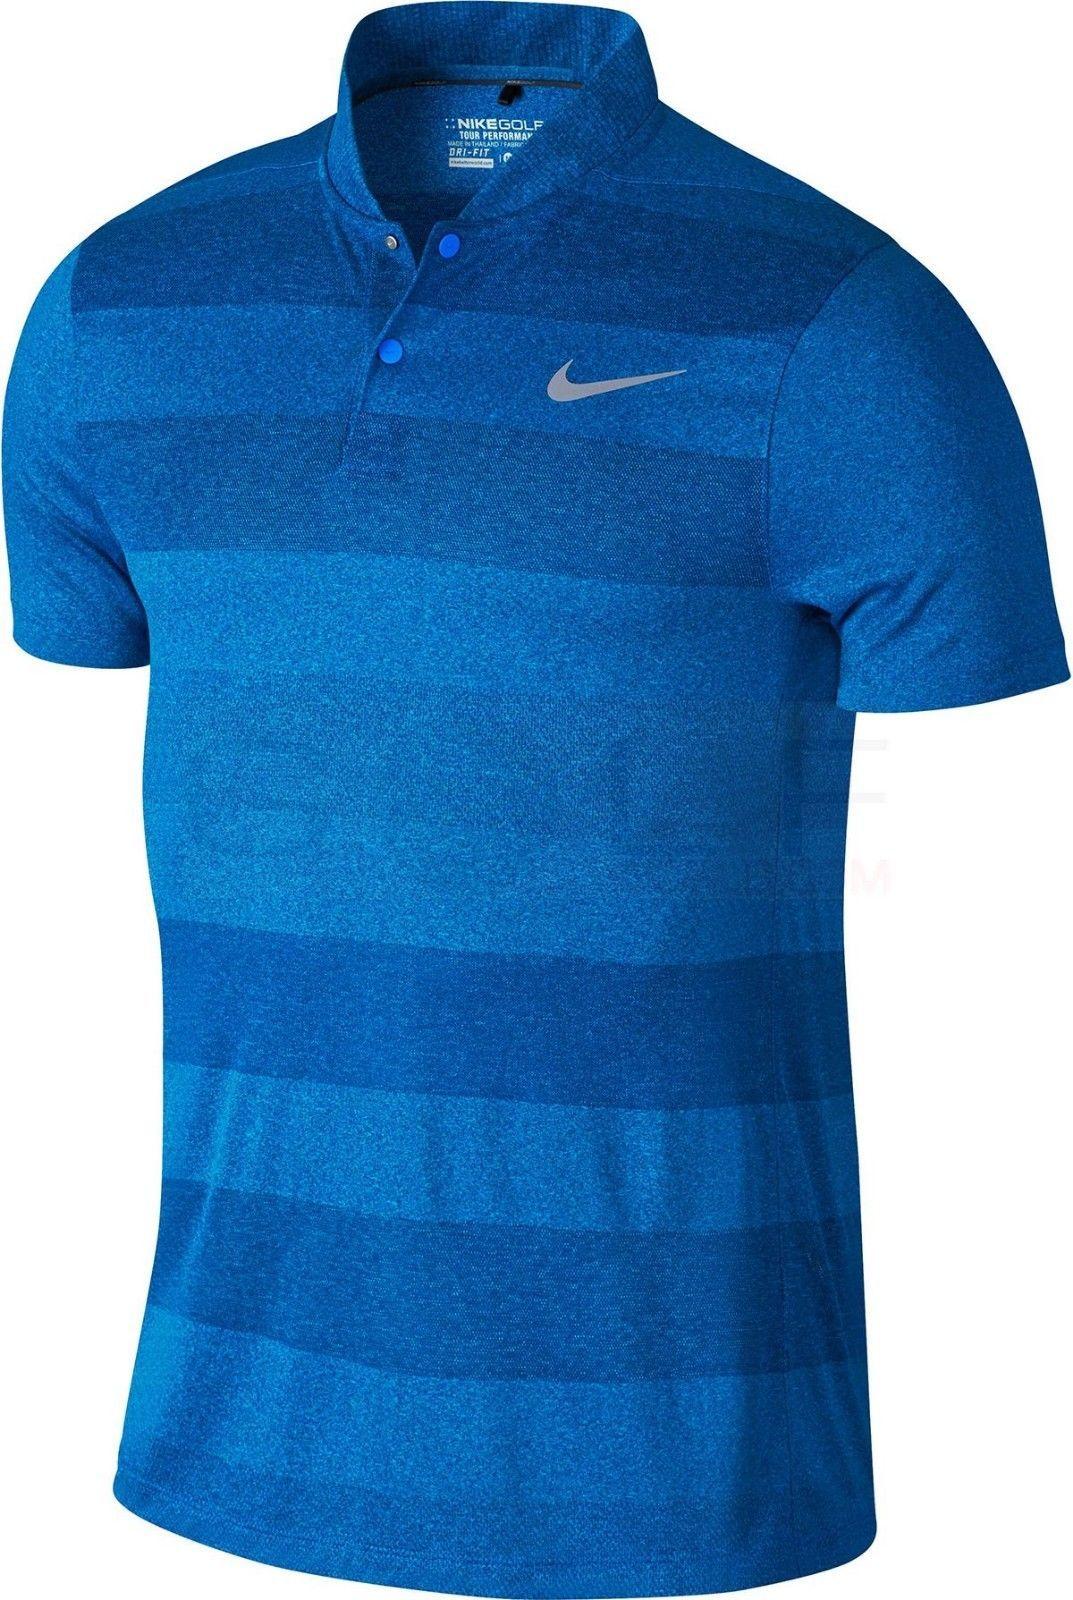 New Nike Mm Fly Blade Polo Golf Shirt Medium Photo Blue Style